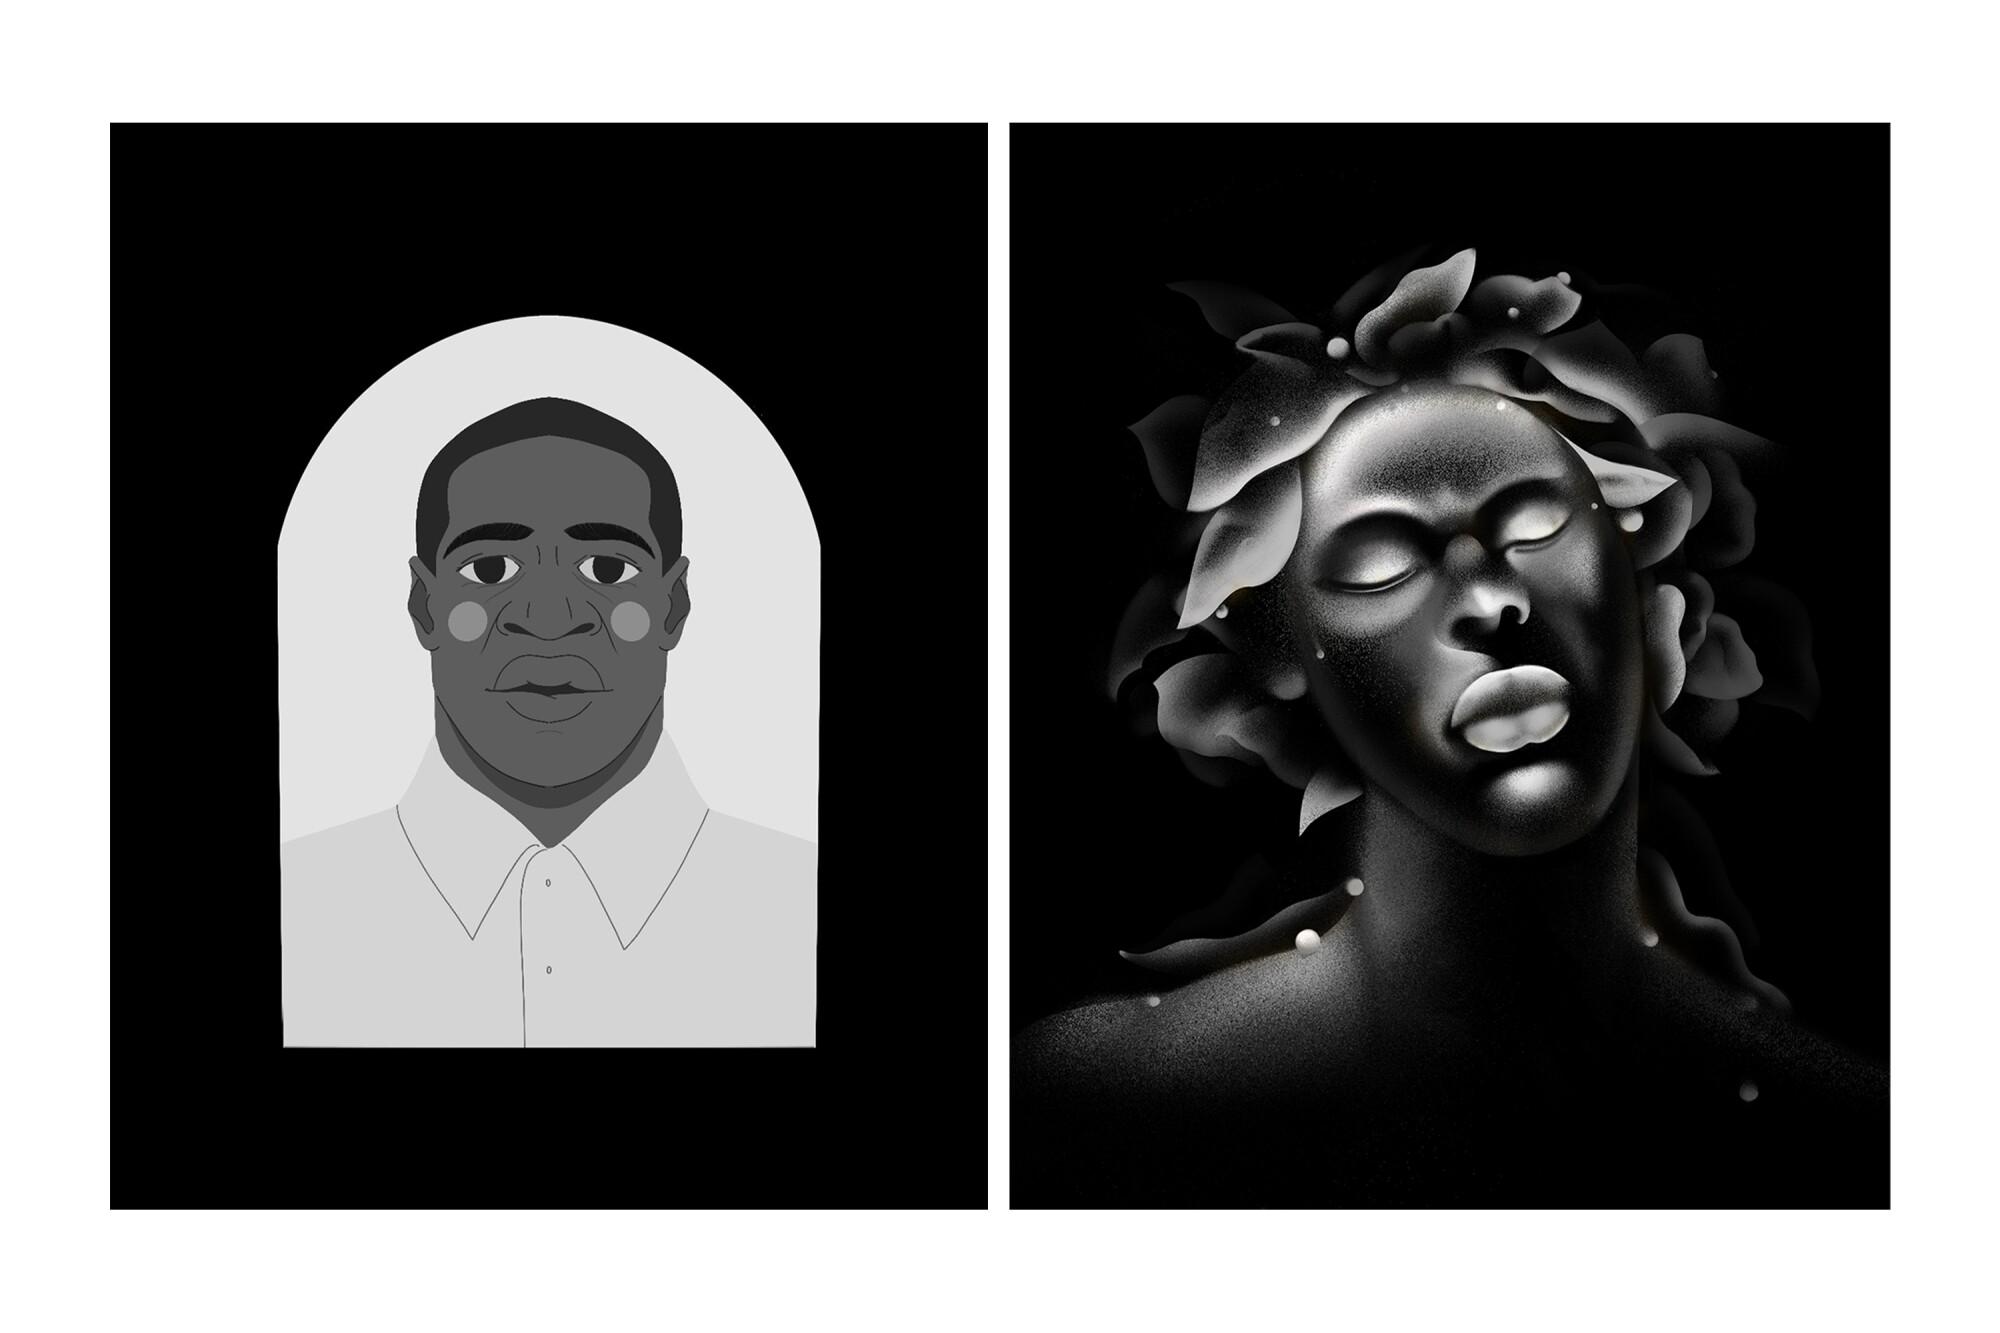 Illustrations by D'Ara Nazaryan, left, and Debora Cheyenne